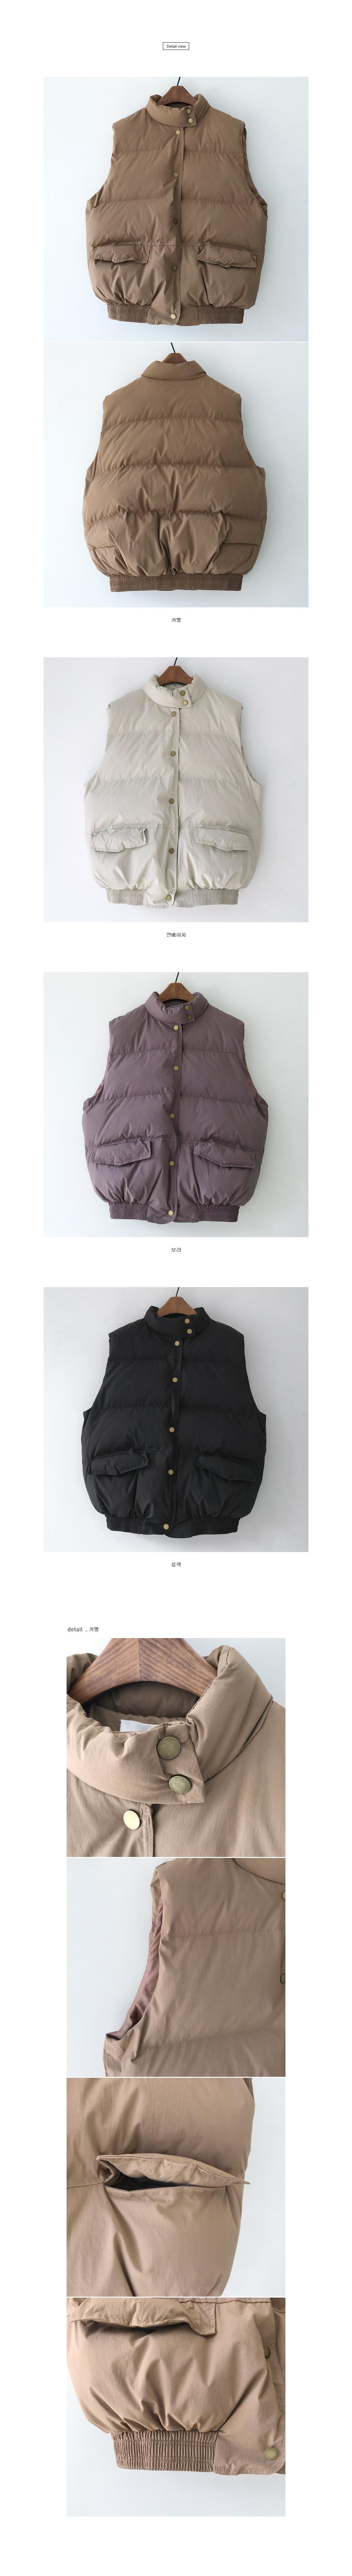 INFOWELLON Padded Vest